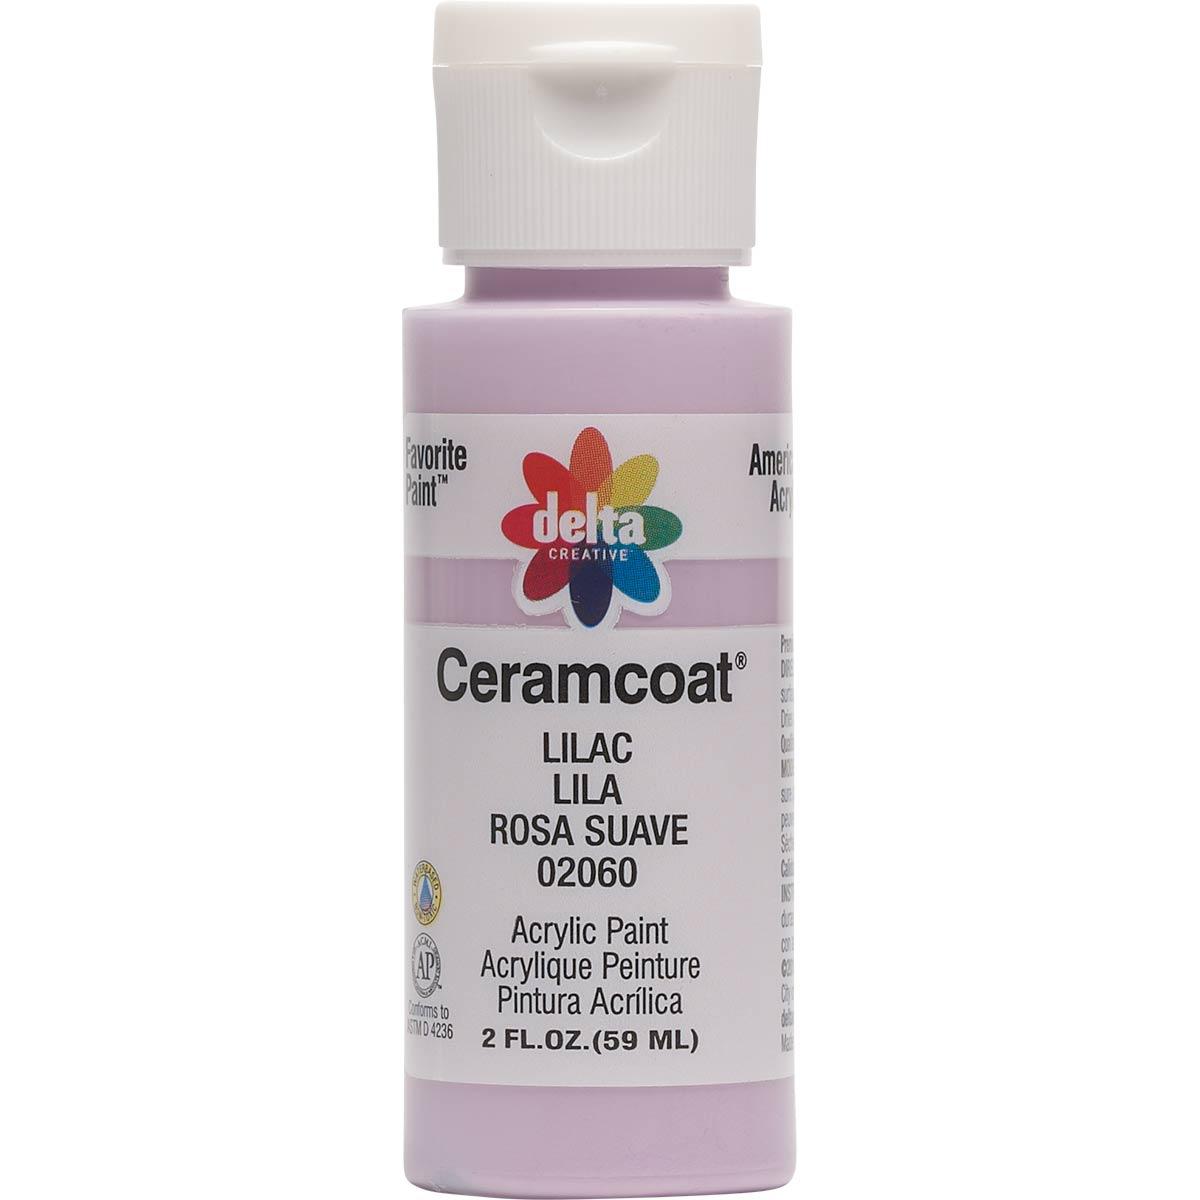 Delta Ceramcoat ® Acrylic Paint - Lilac, 2 oz. - 020600202W